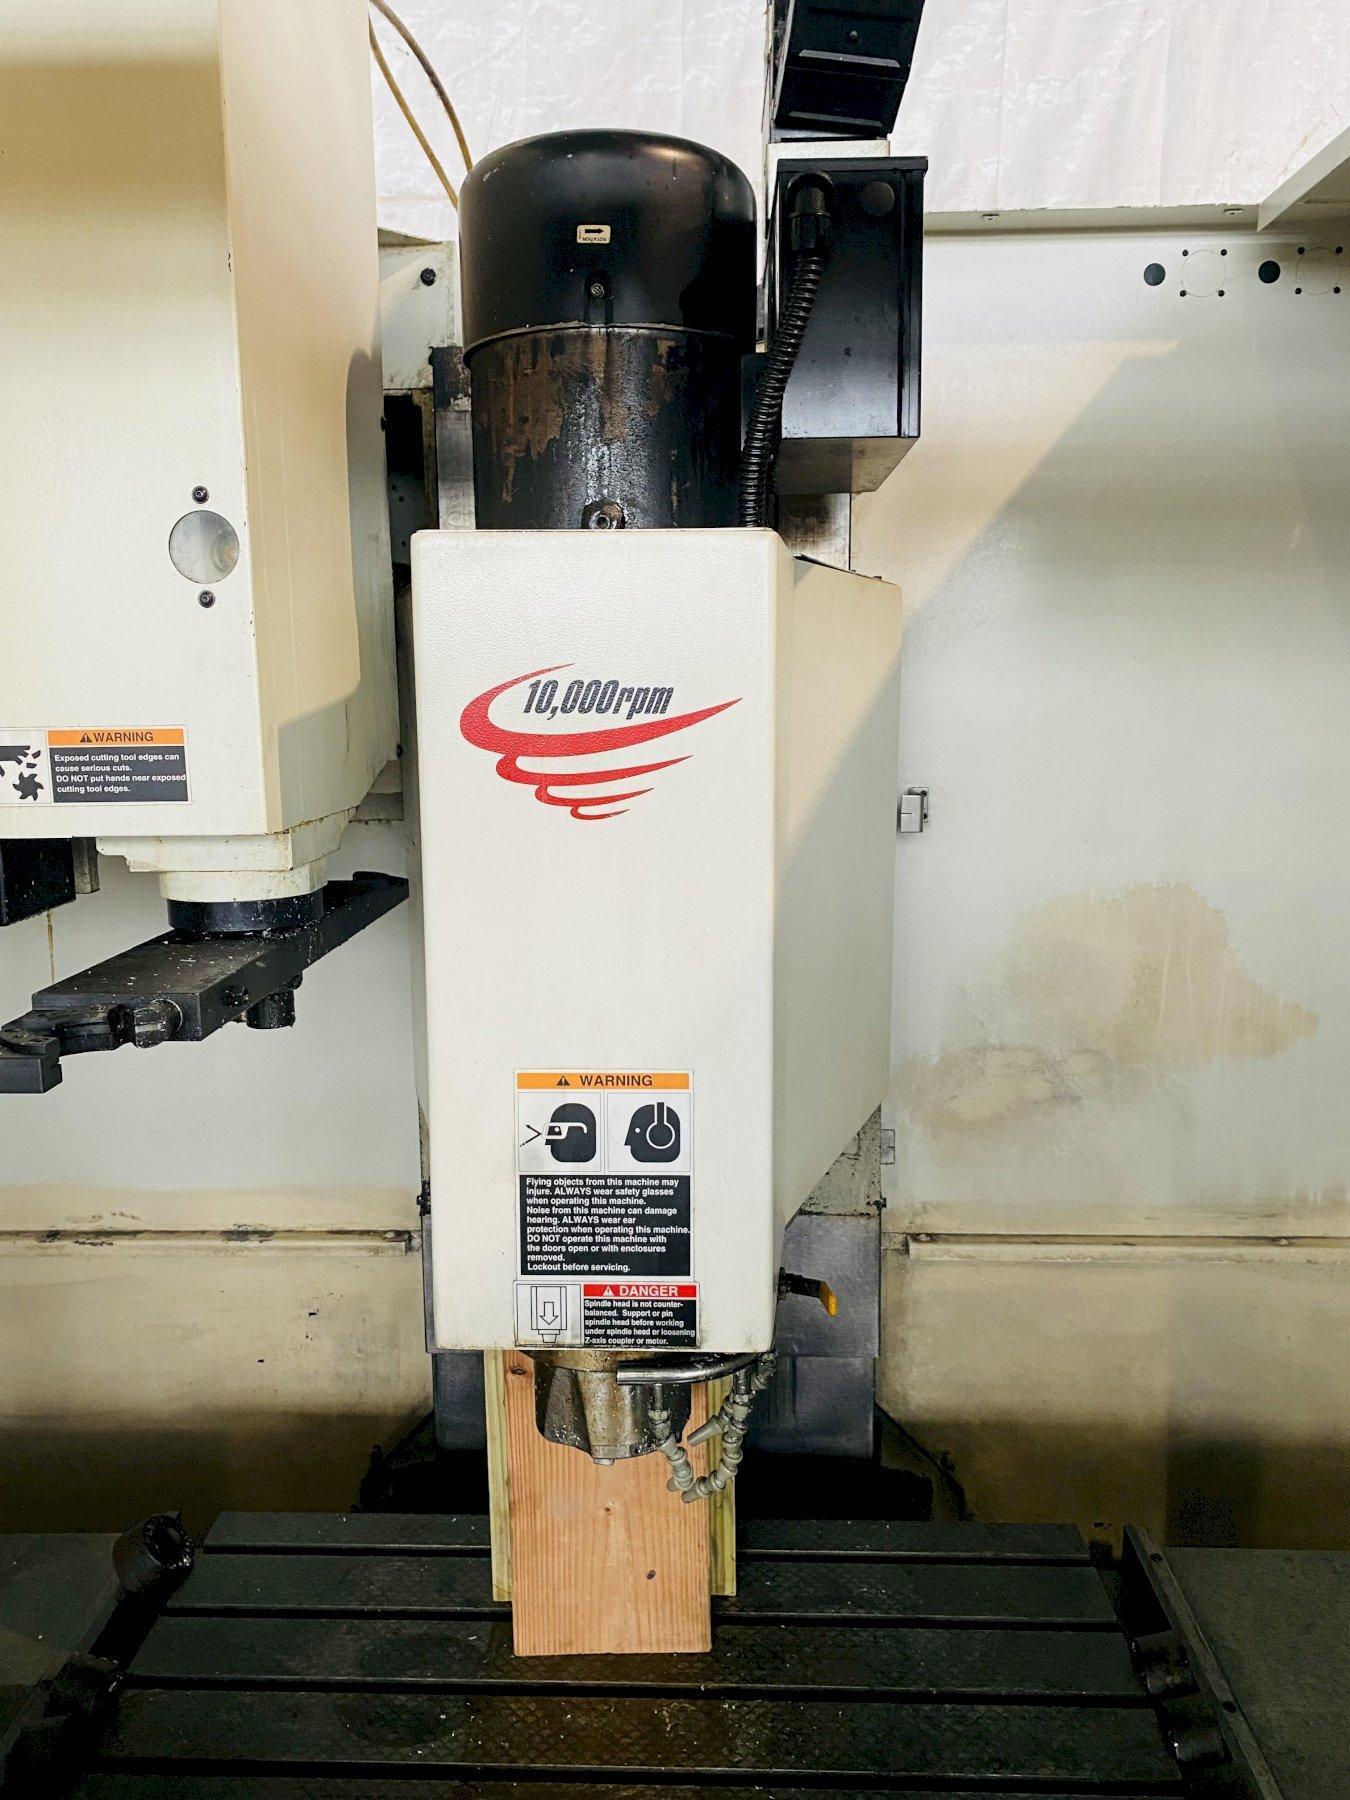 FADAL 3020 HT VERTICAL MACHINING CENTER. STOCK # 0633721